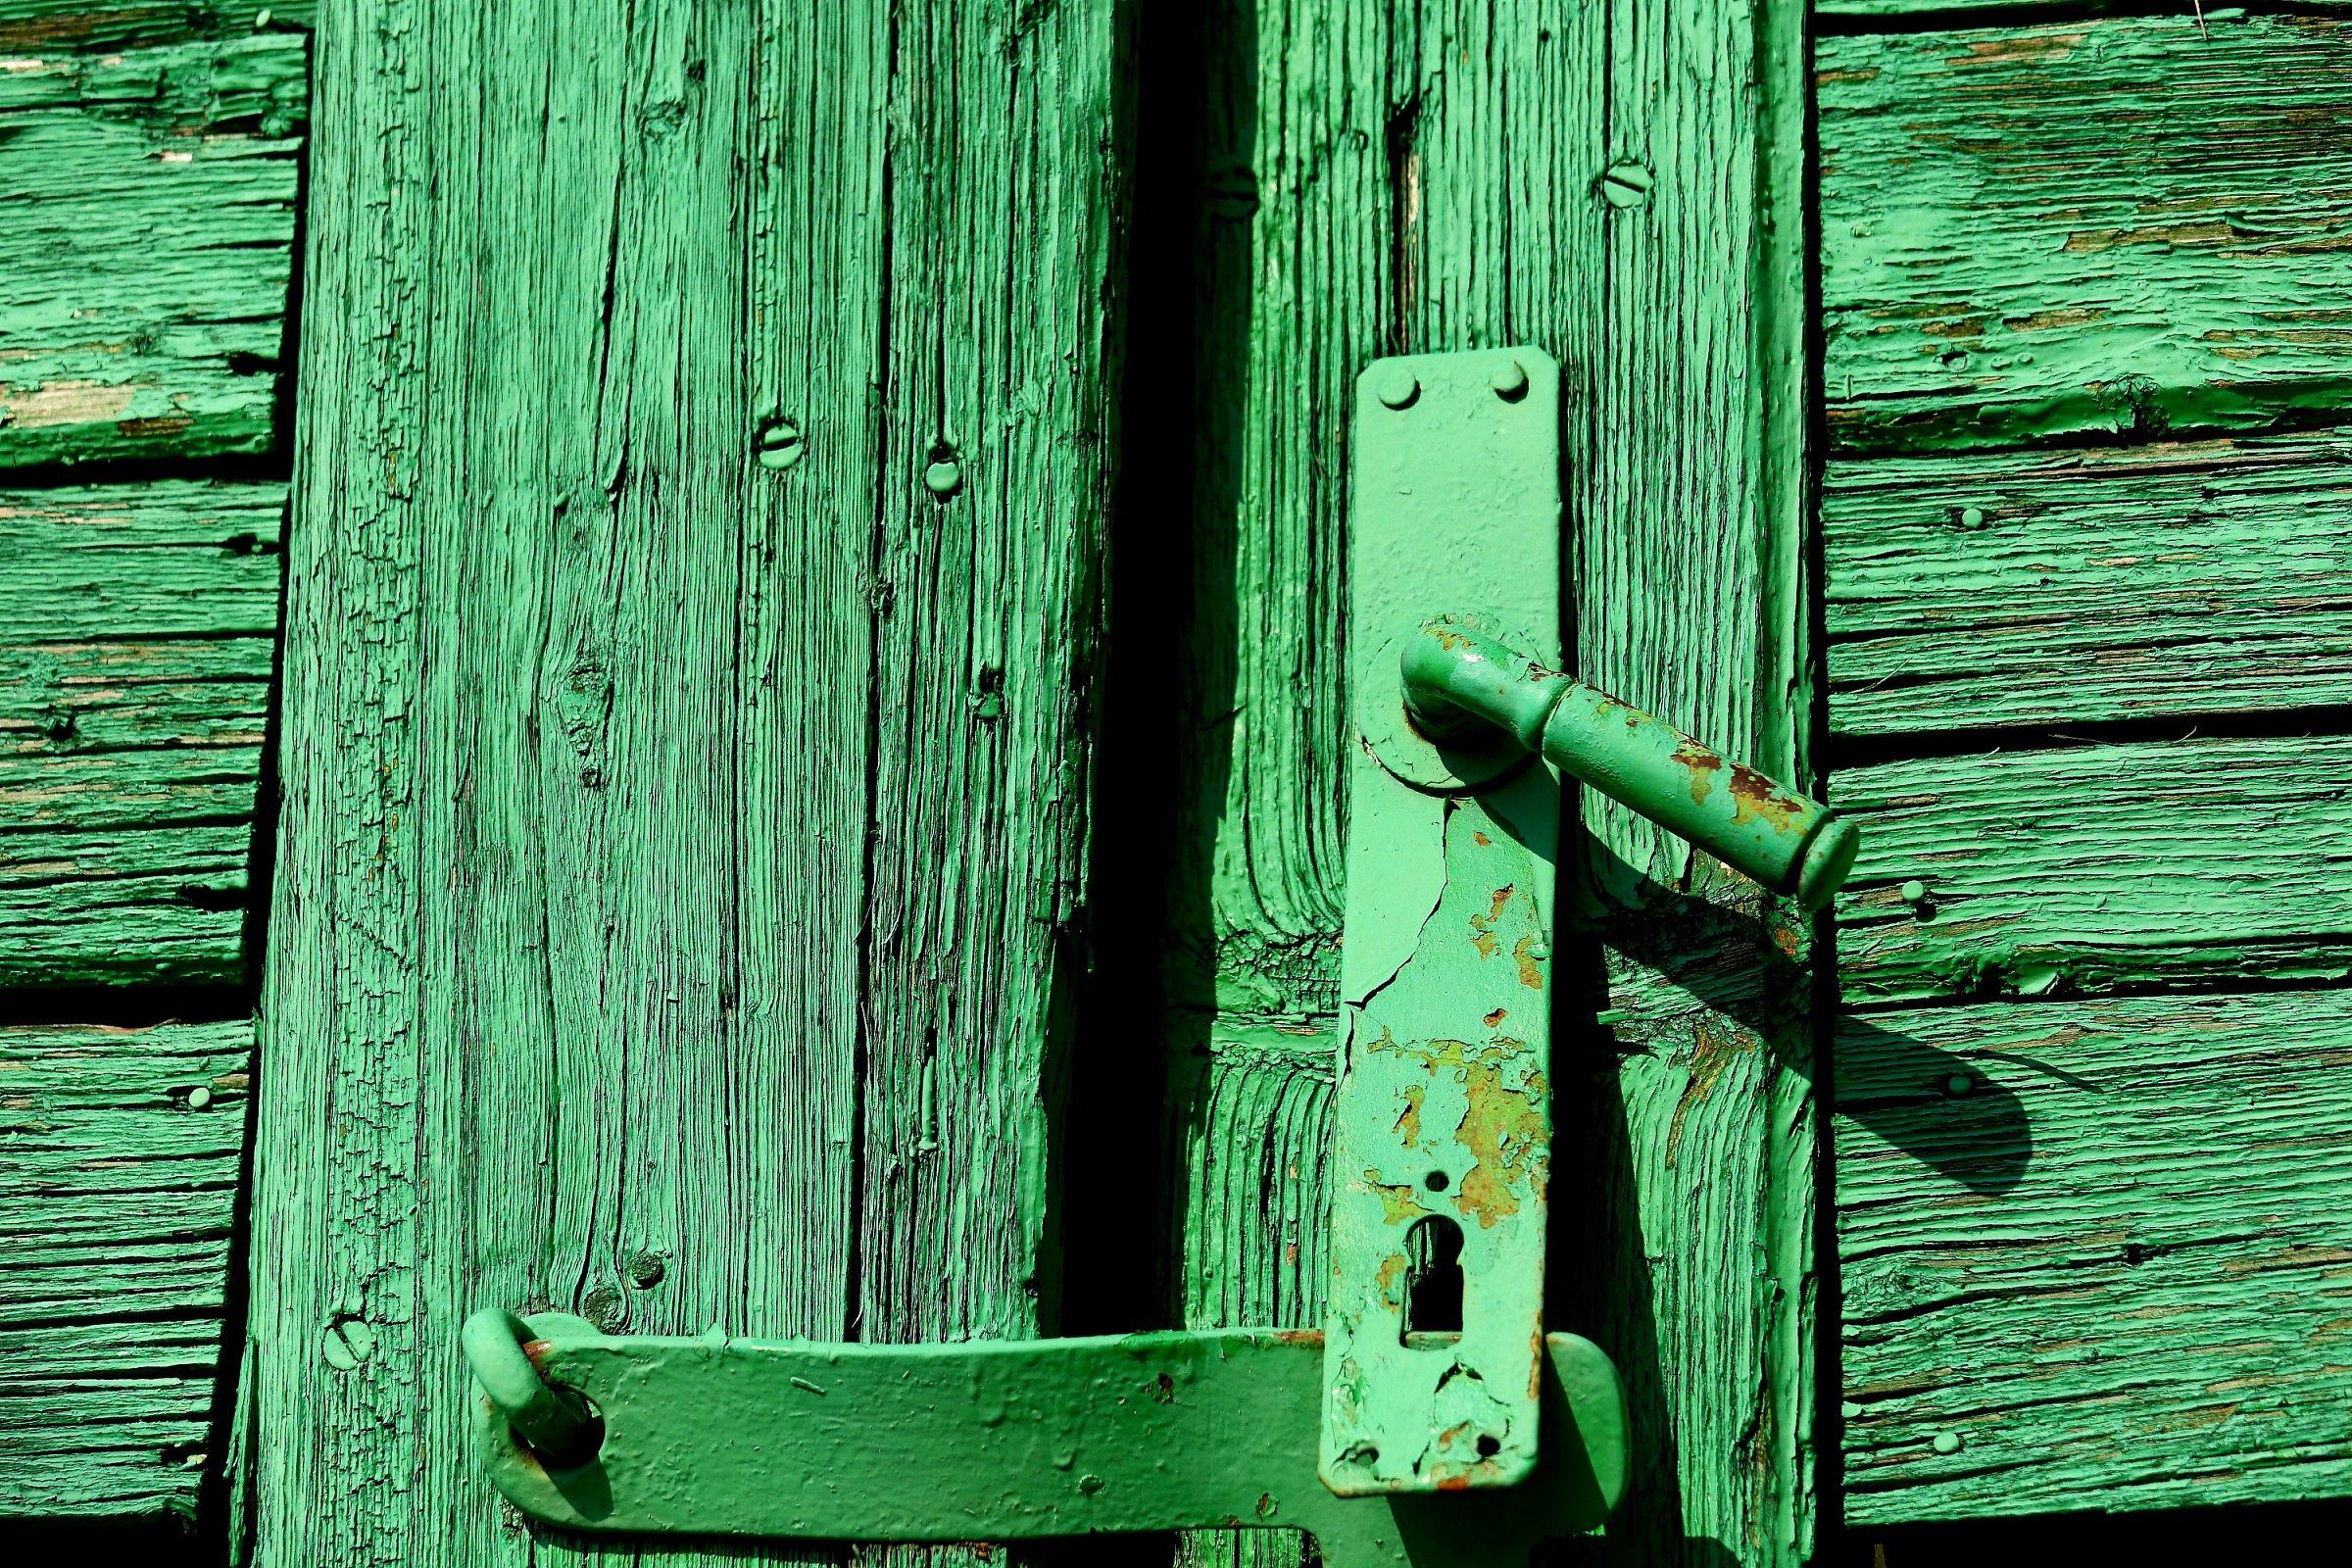 maniglia verde...